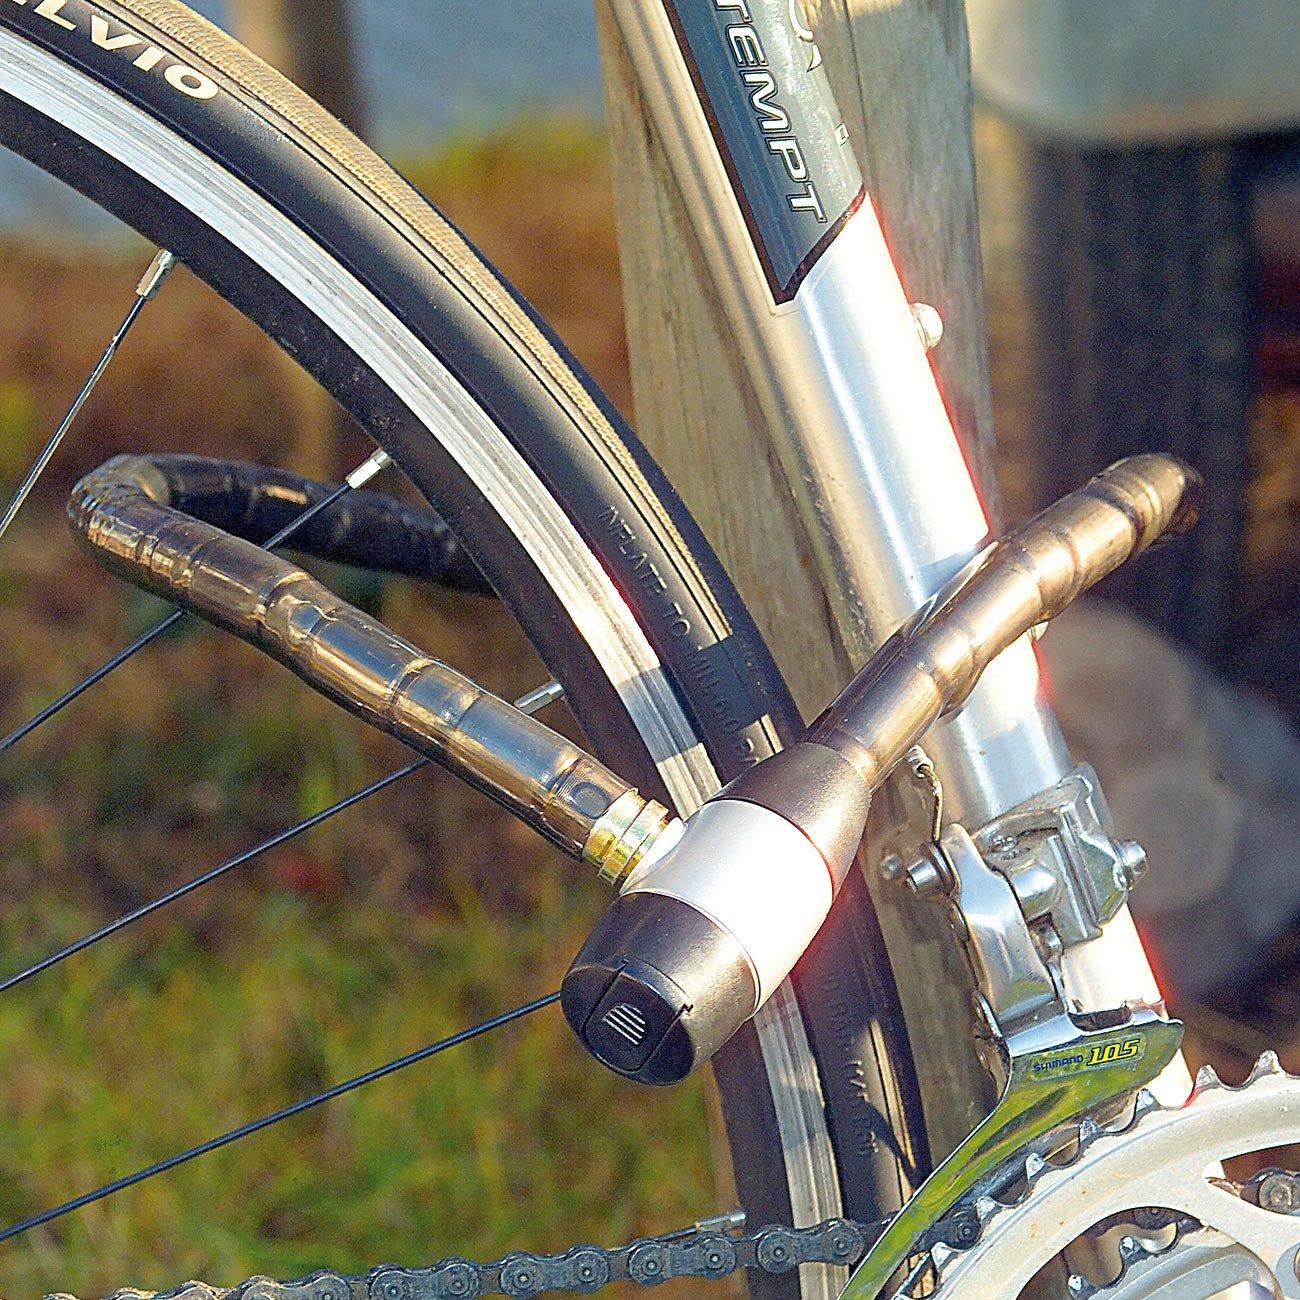 Pearl Fahrradschloss Test